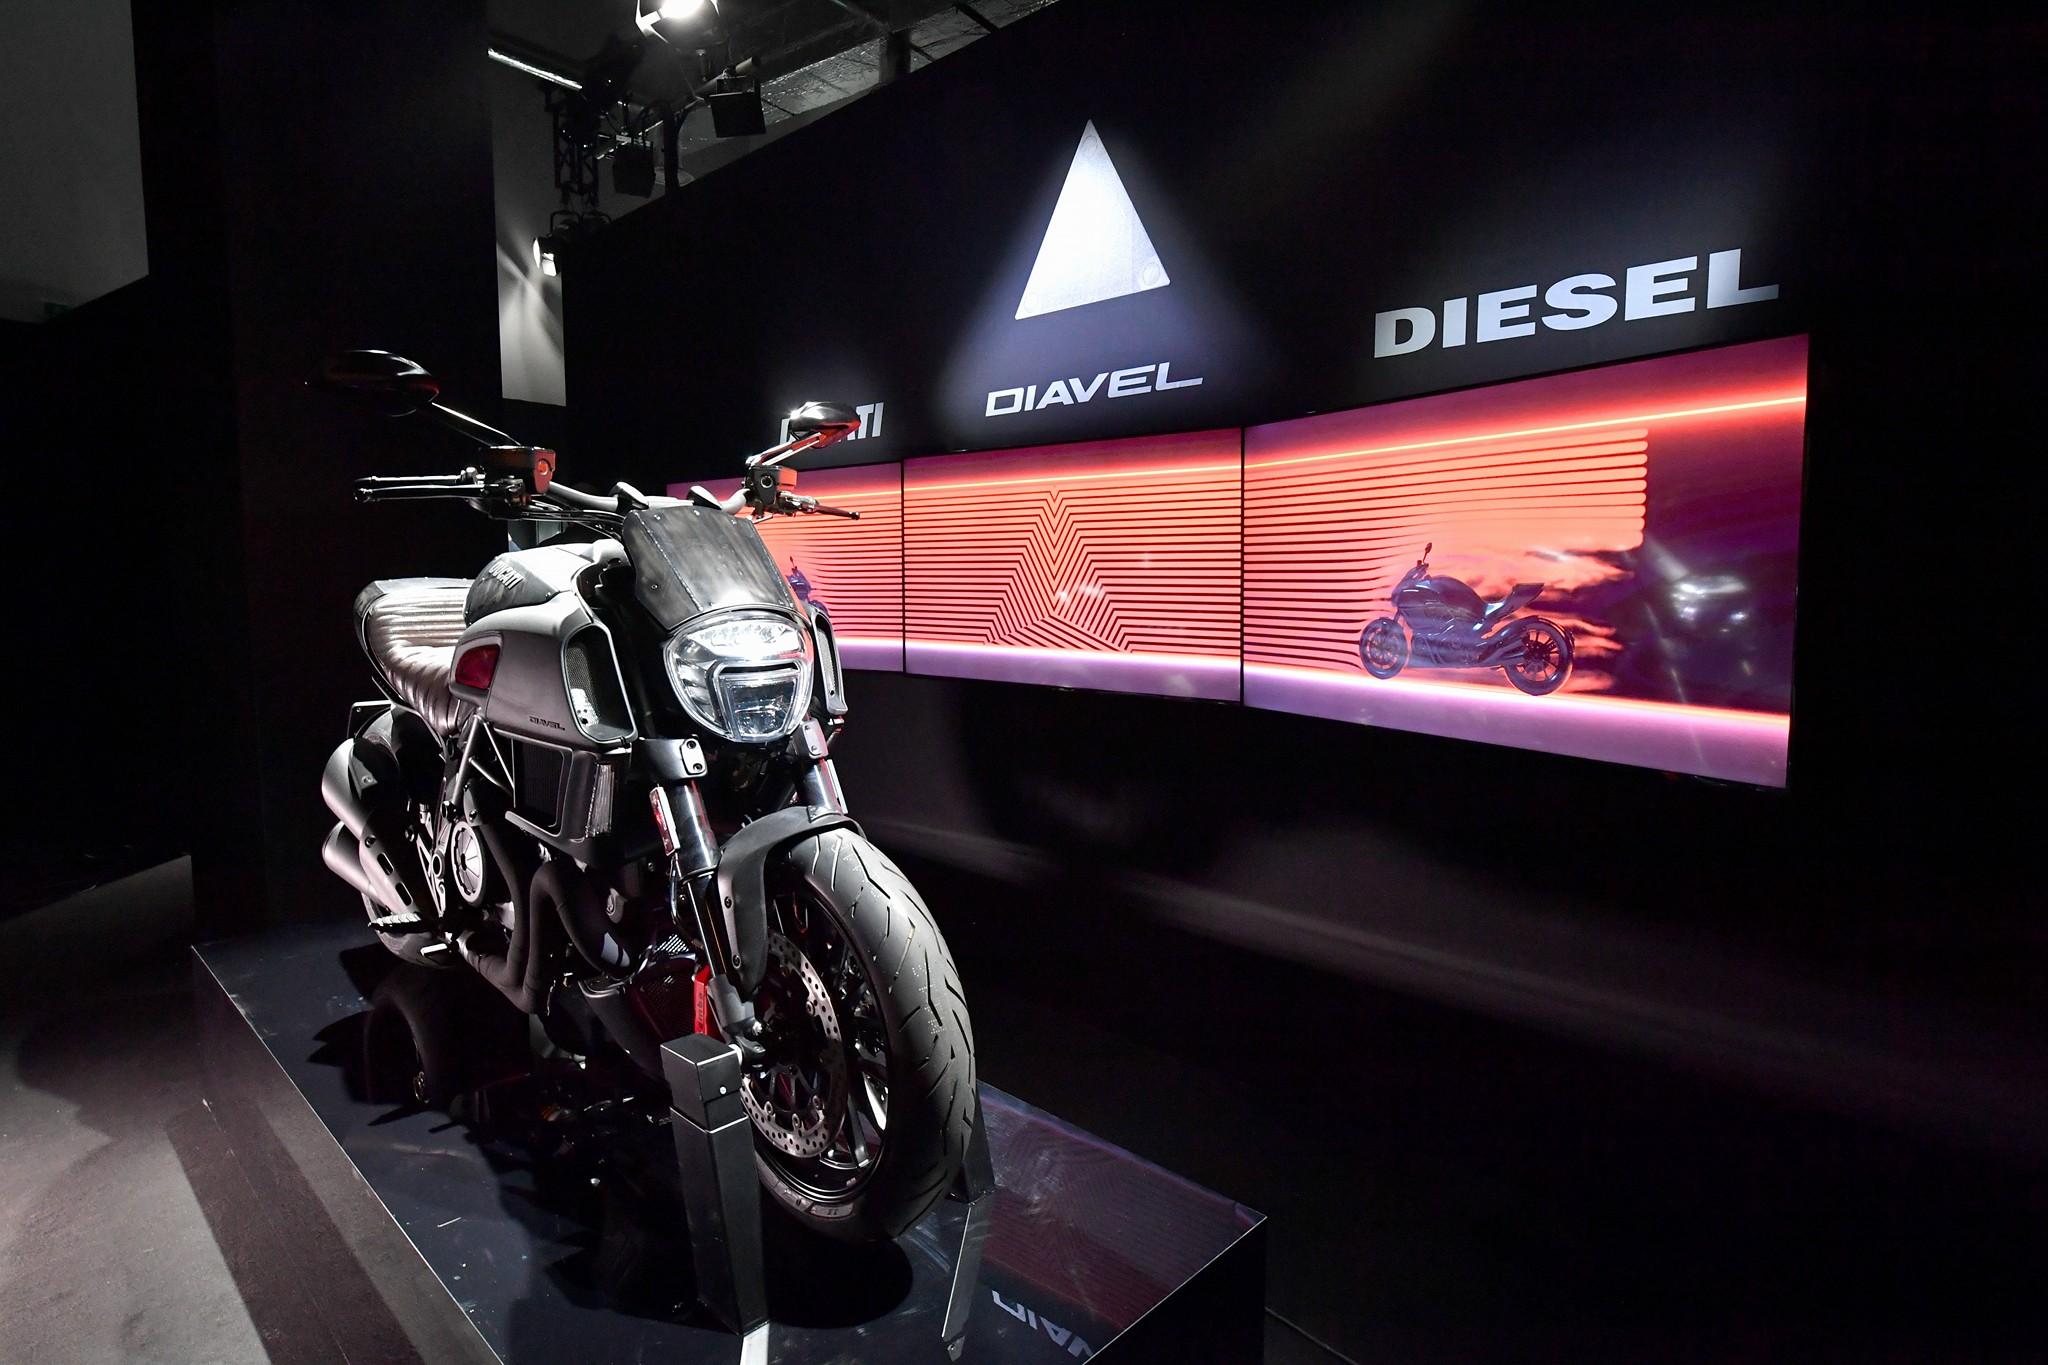 Ducati Diavel Diesel - 2017 - front / avant